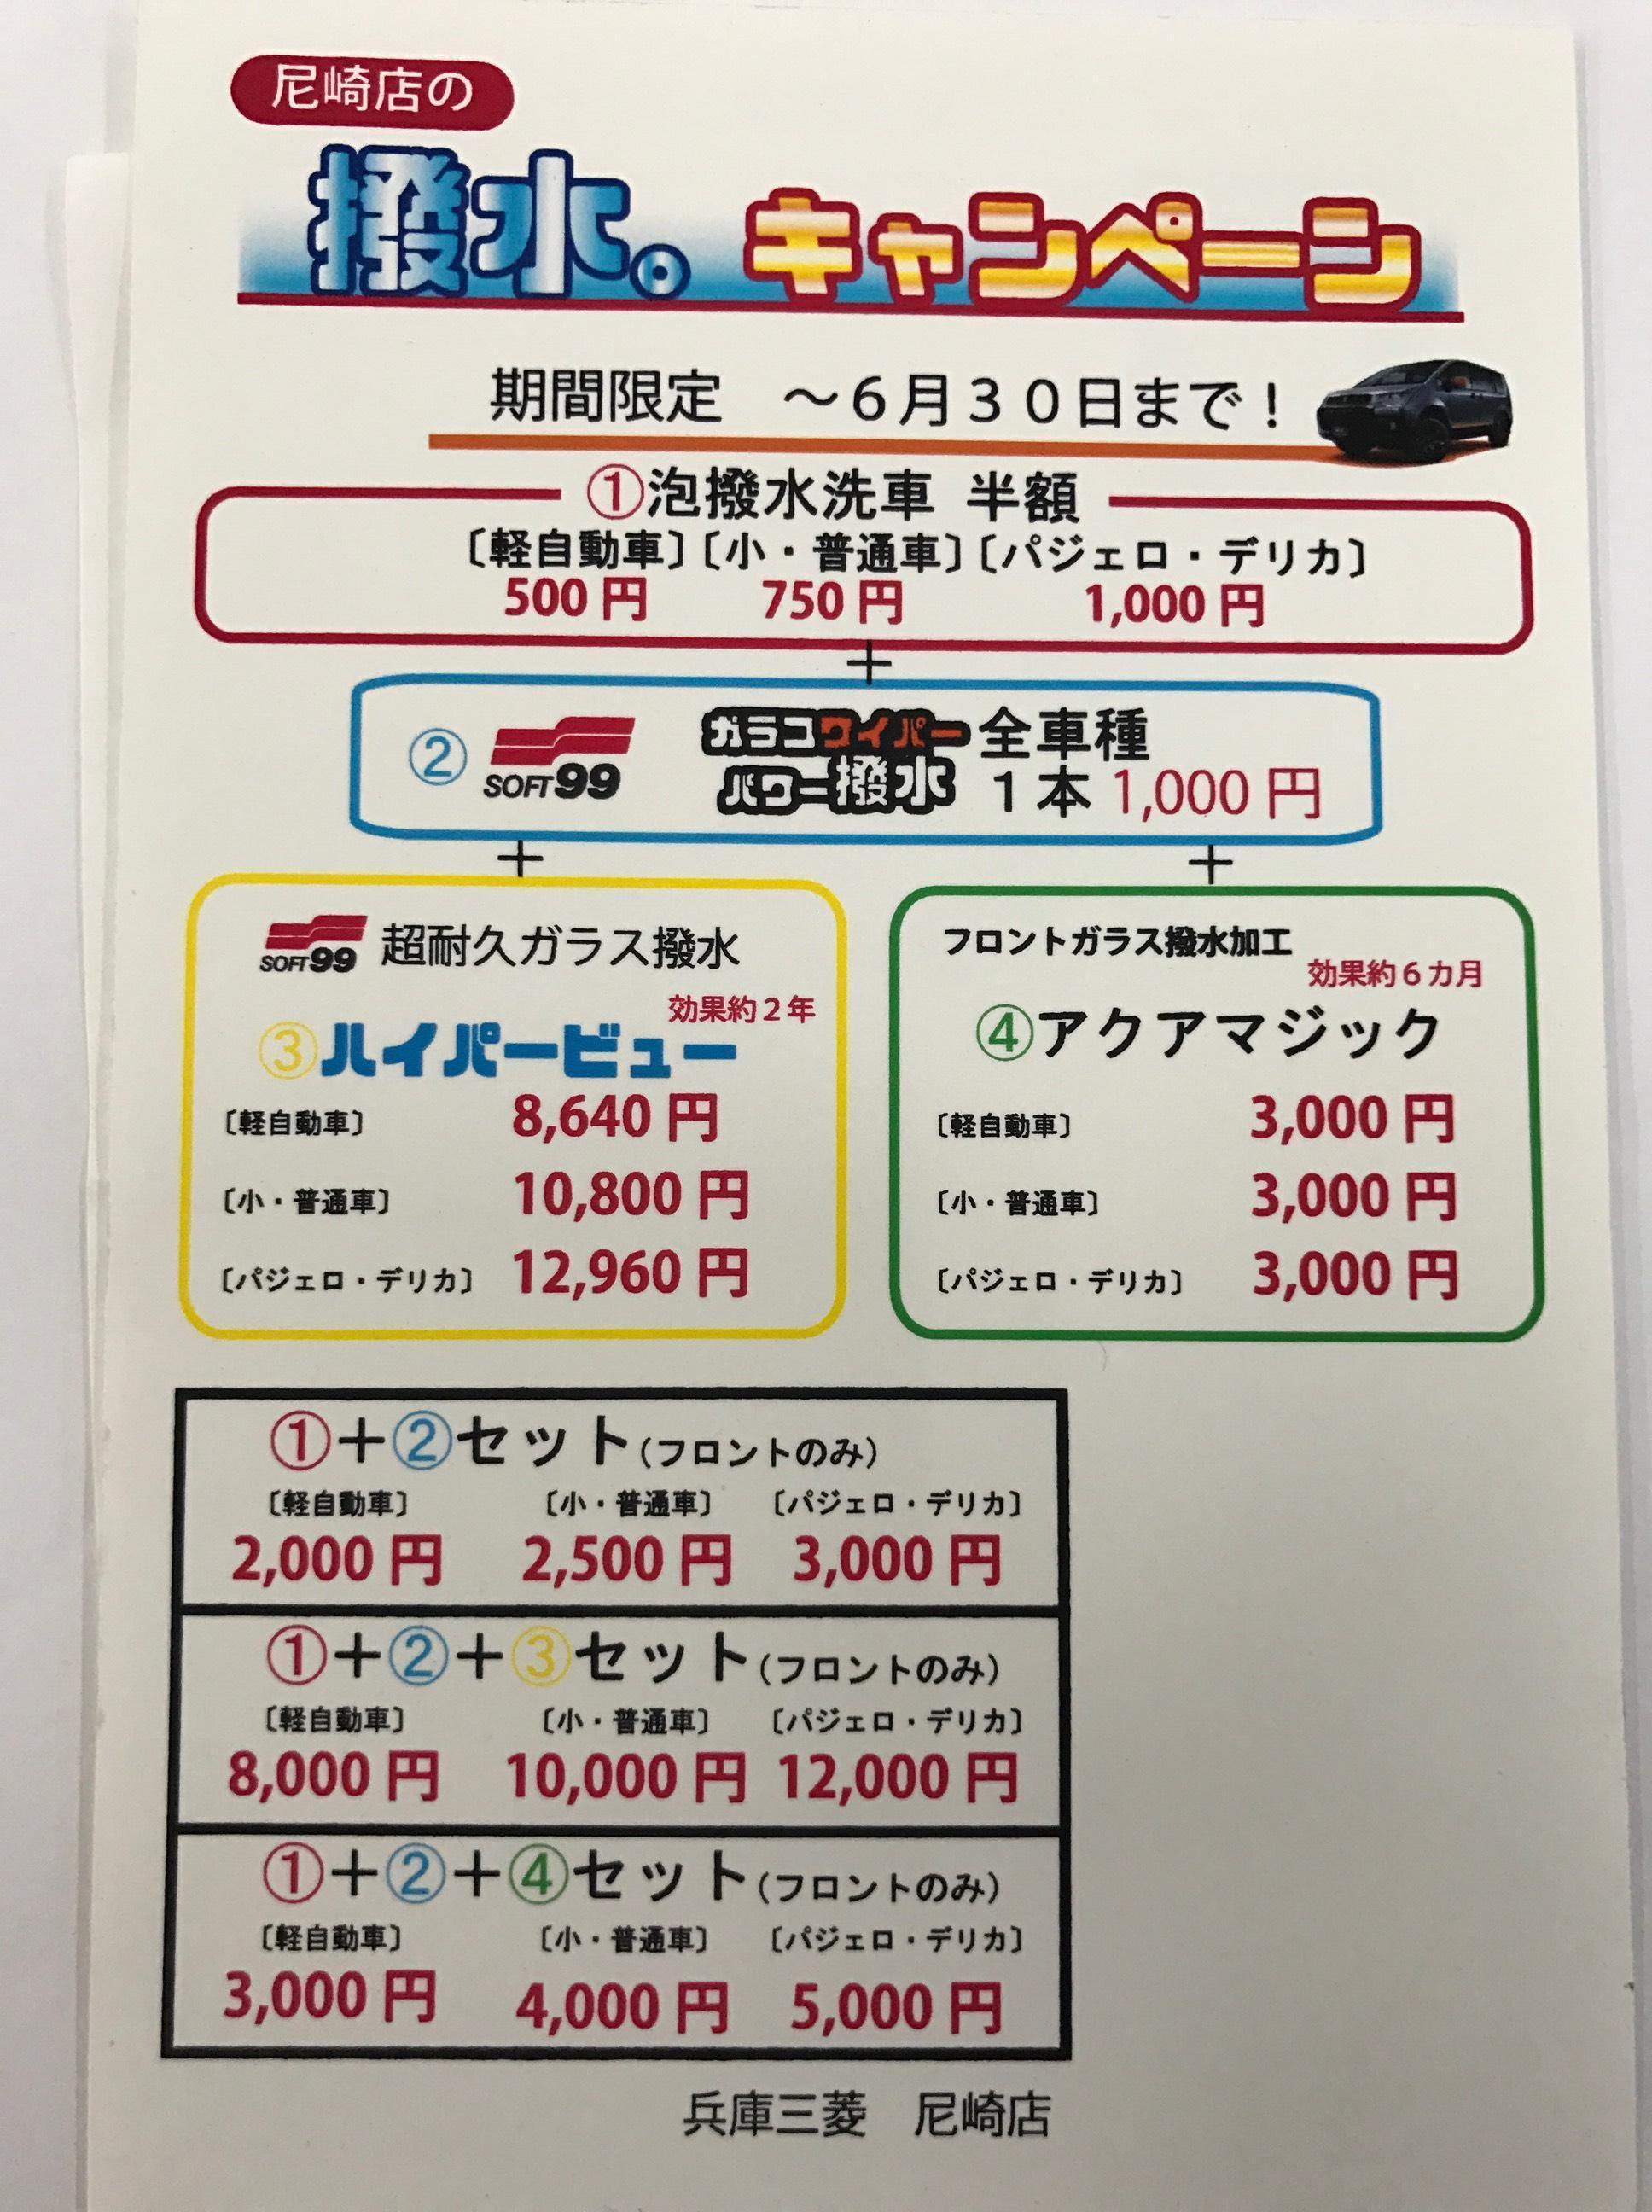 https://www.hyogo-mitsubishi.com/shop/amagasaki/files/8c0fb88d8811c6b110474da248cb0cddccf4926d.jpg